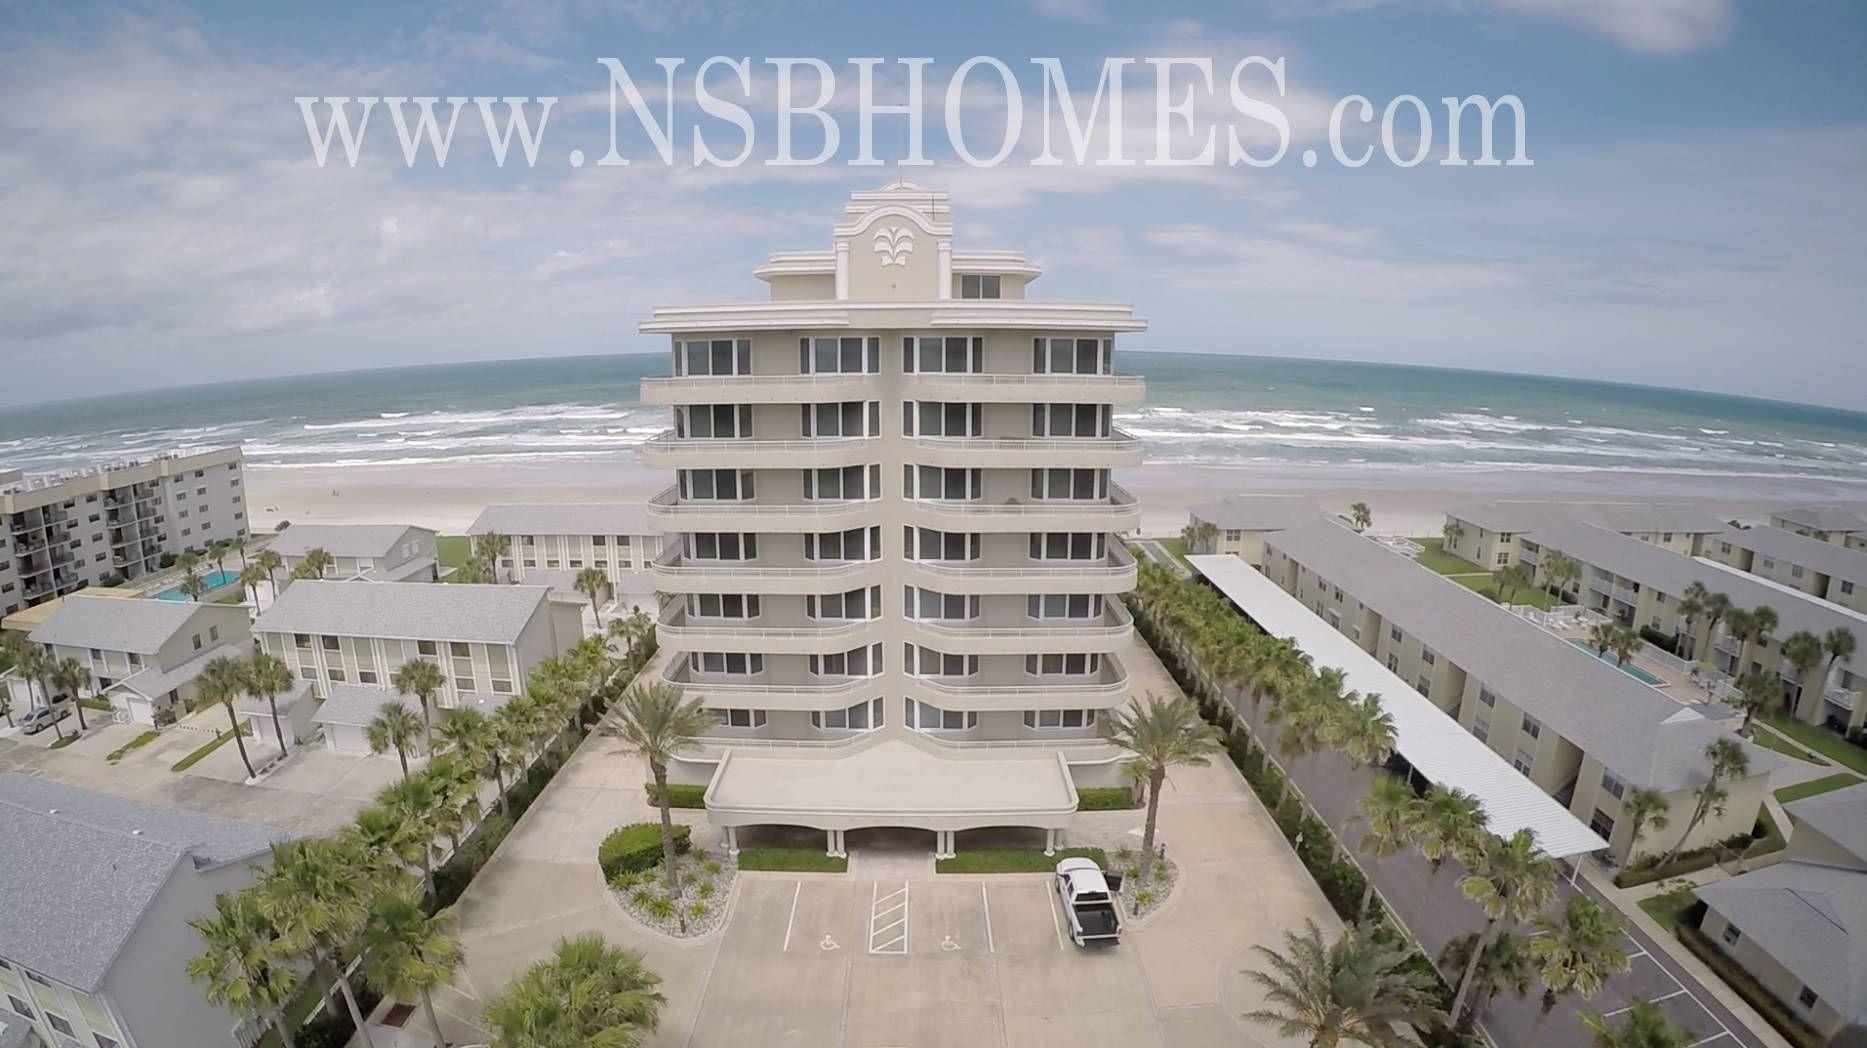 cf8101867fdb476bd7cd504112081ca7 - Sea Coast Gardens New Smyrna Beach Fl